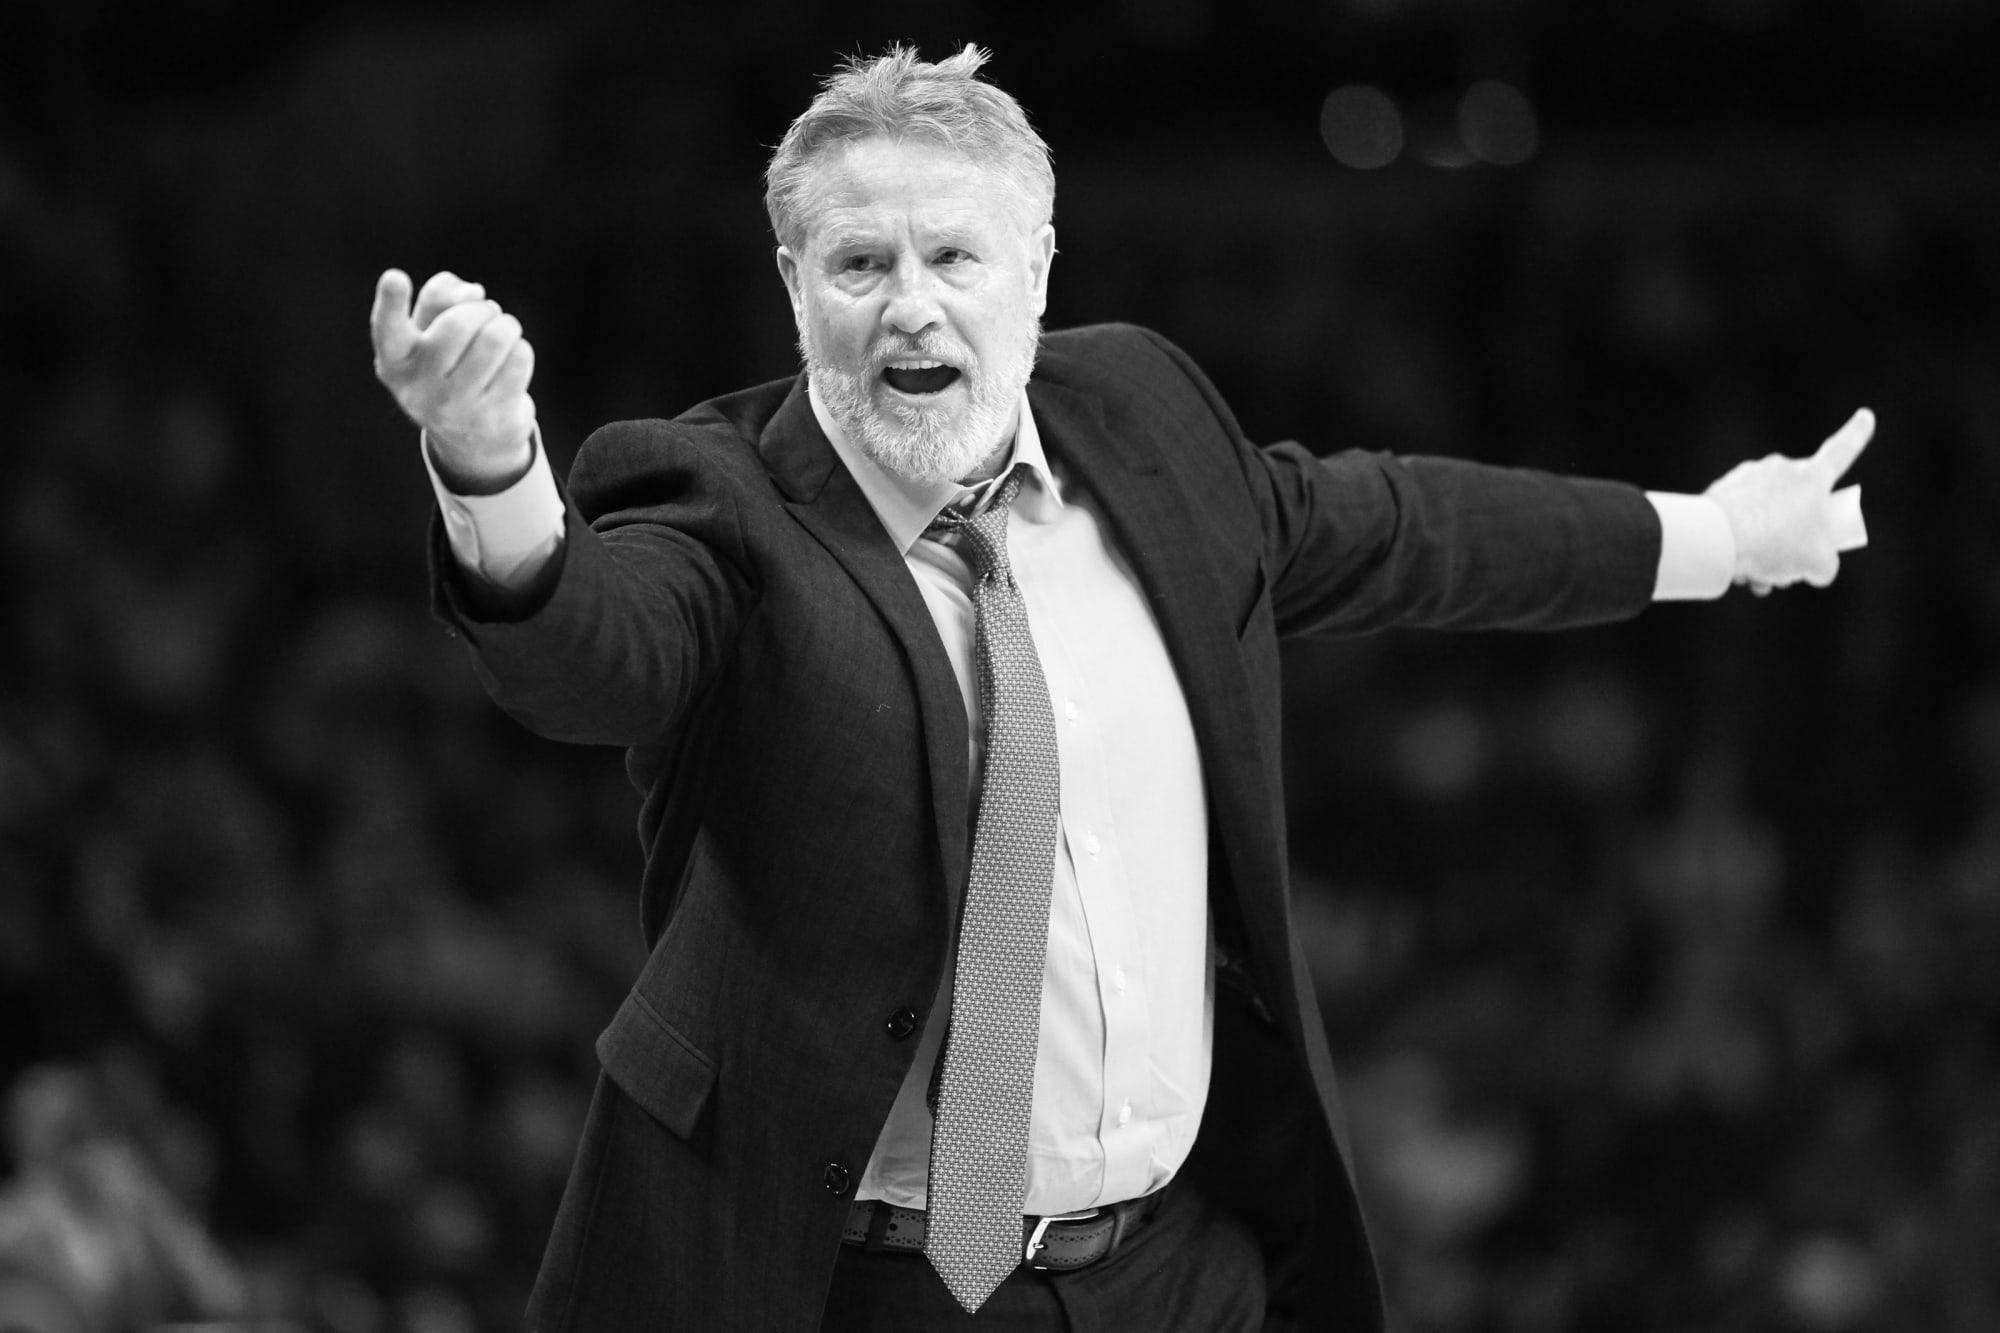 Philadelphia 76ers: What must Brett Brown accomplish to keep his job?